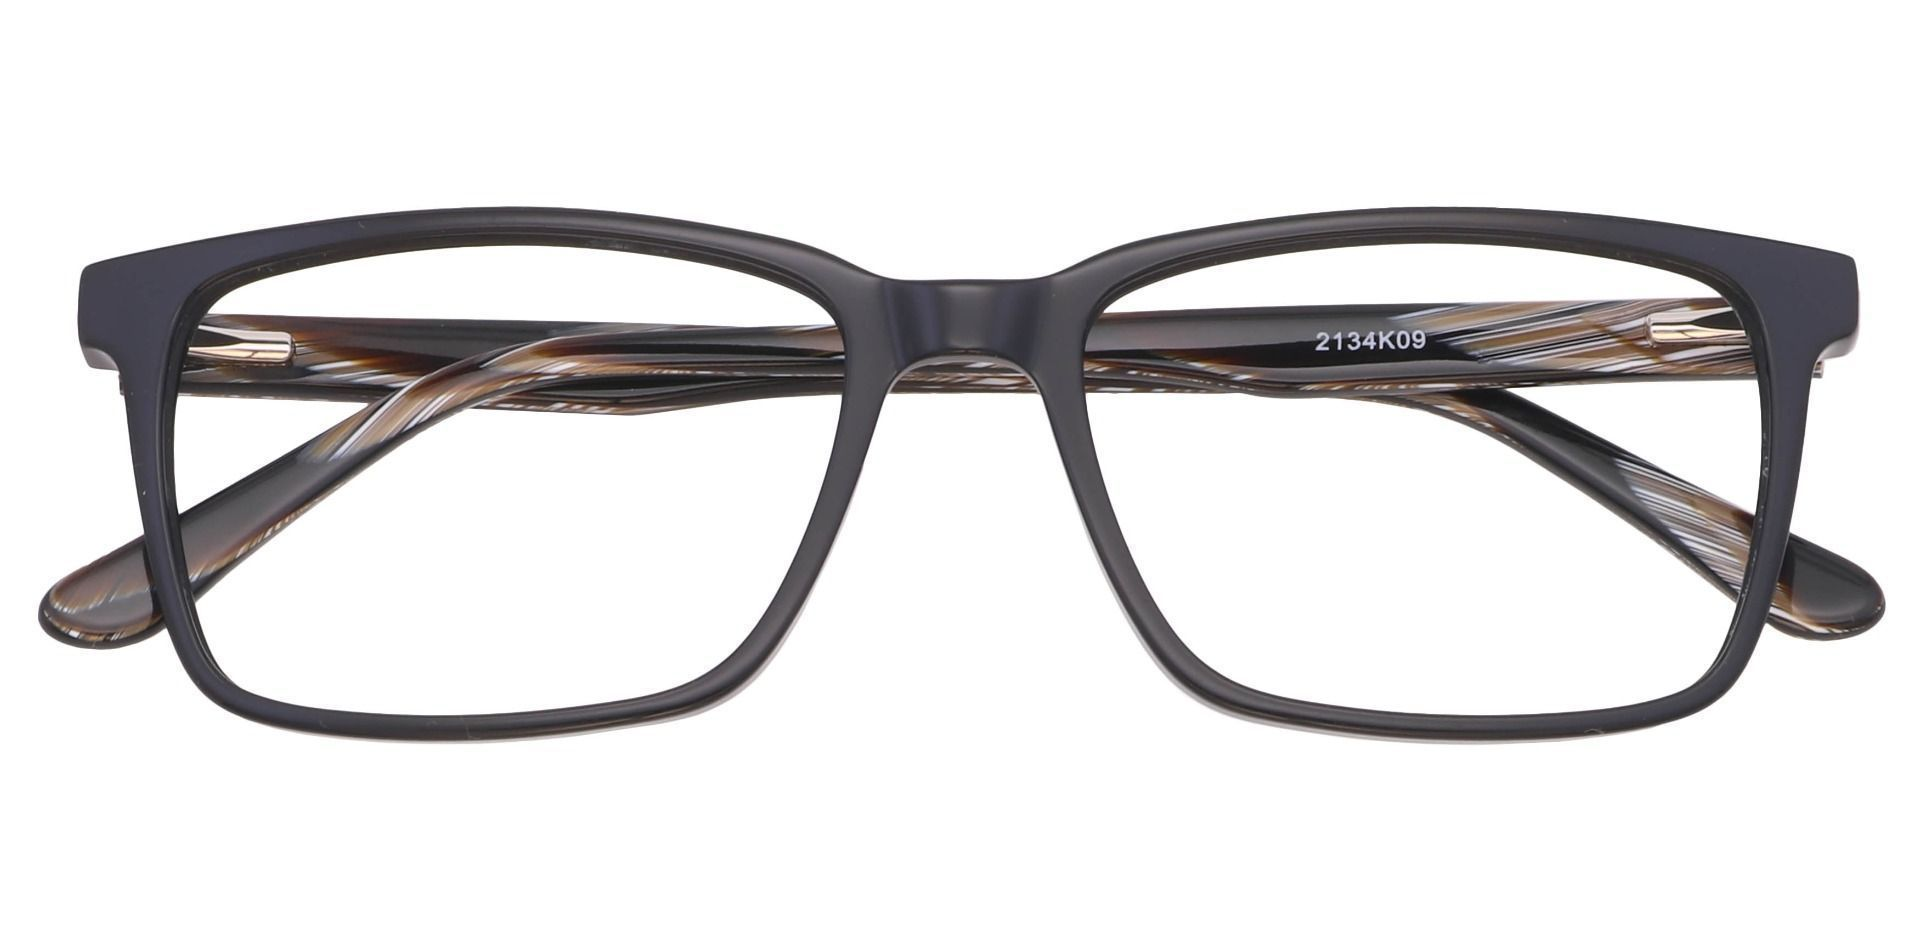 Venice Rectangle Progressive Glasses - Black